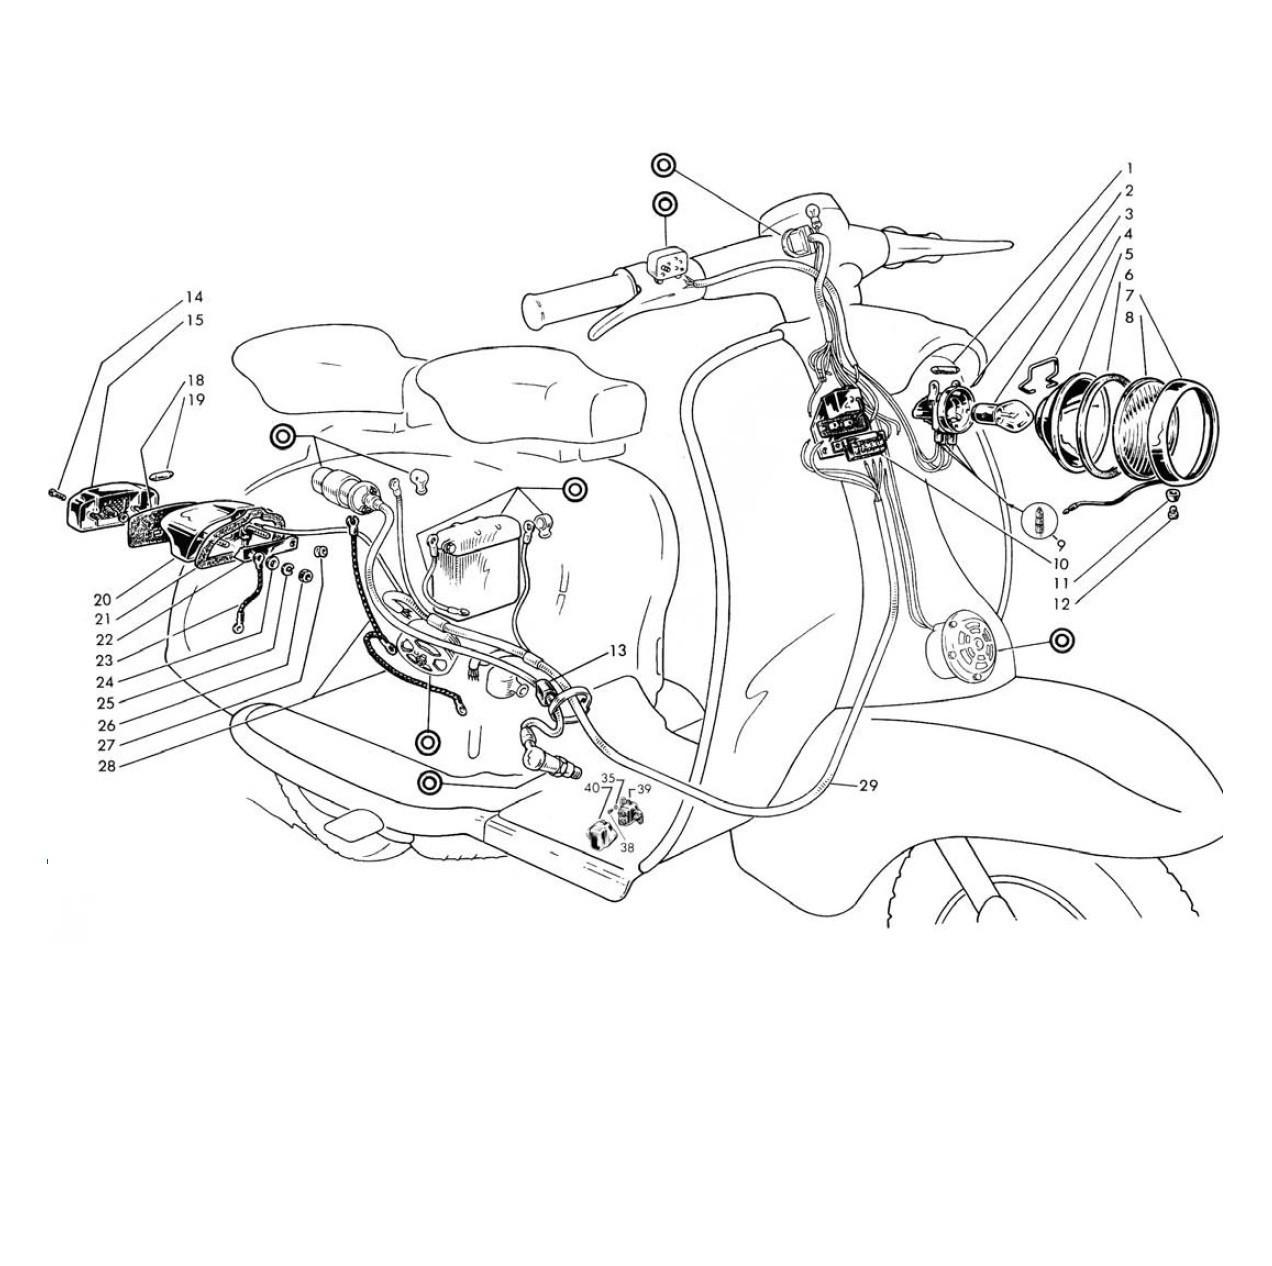 Impianto Elettrico e Fanaleria (Tav.10)